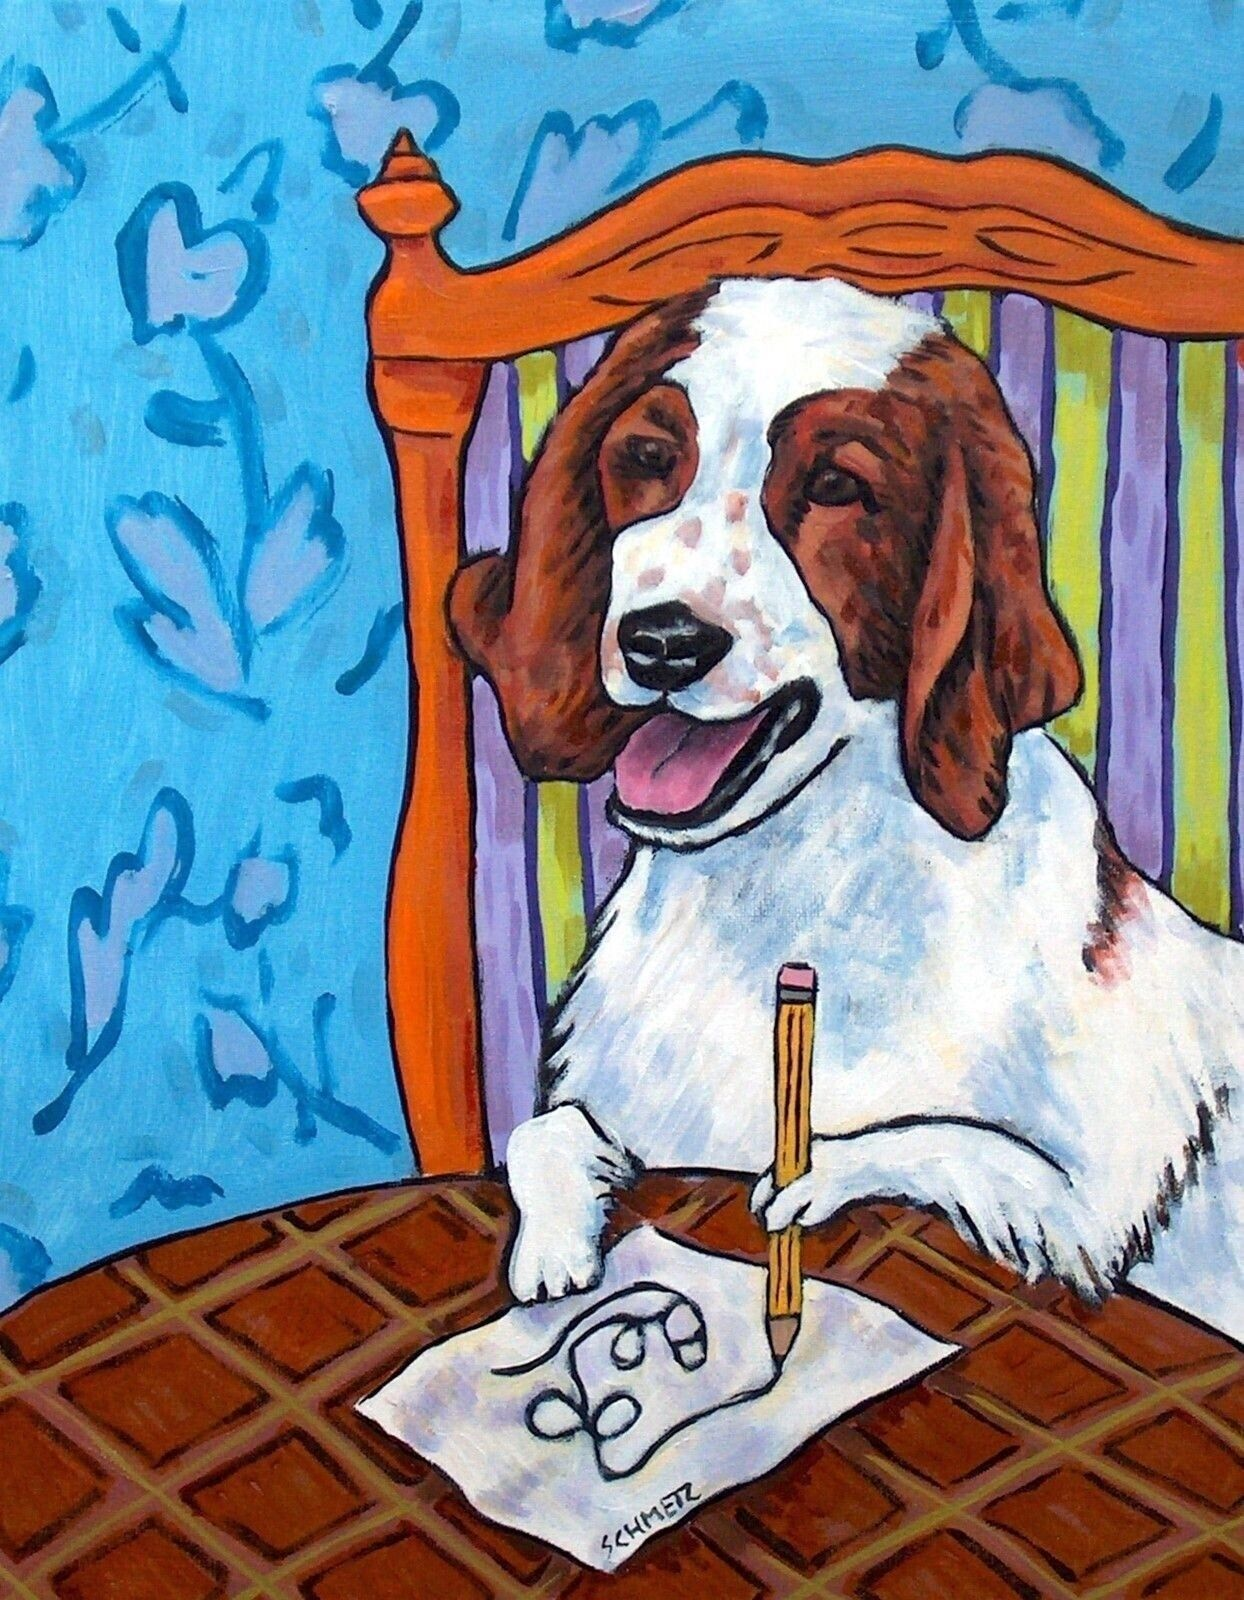 WINE art with husky dog  poster gift modern folk art 4x6   GLOSSY PRINT